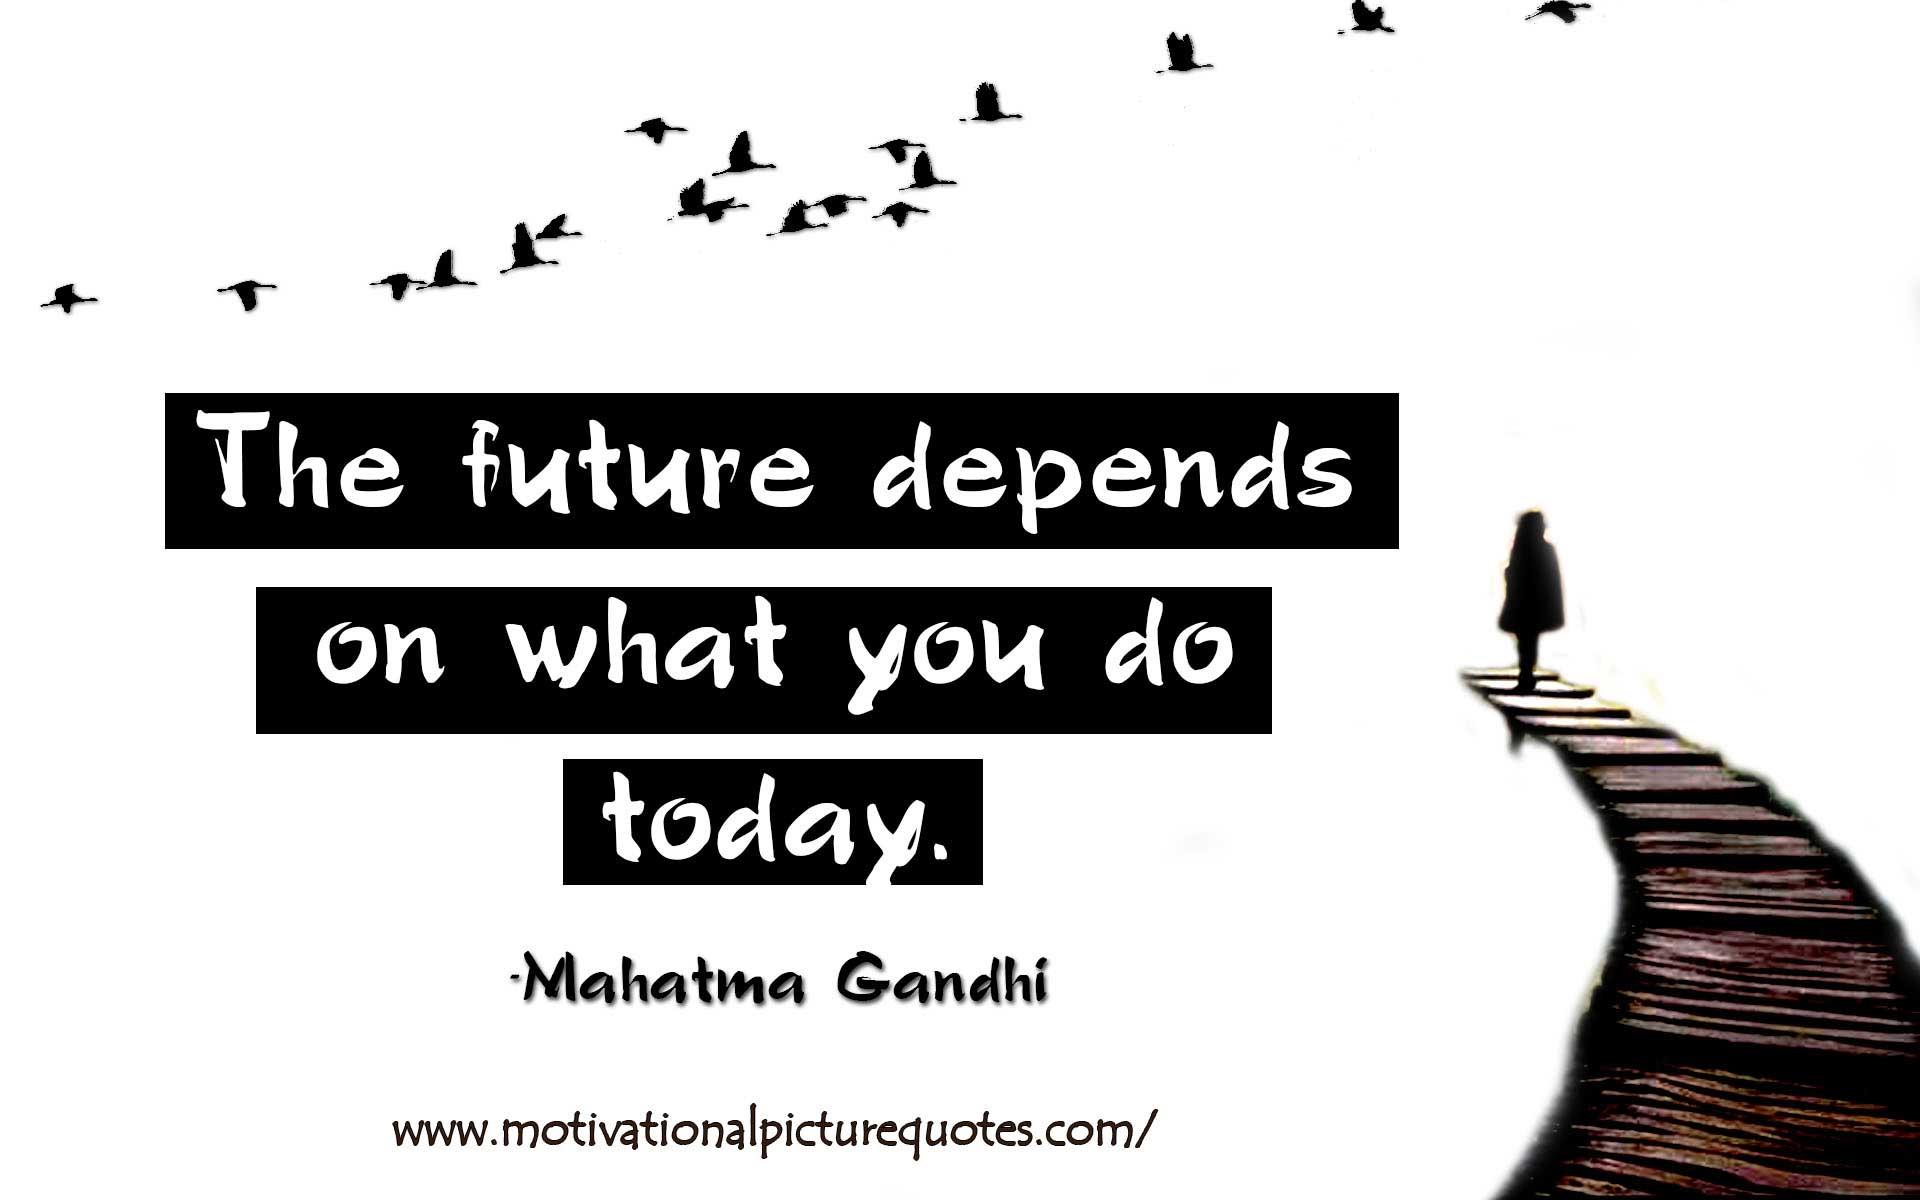 15+ Inspirational Past Present Future Quotes & Images